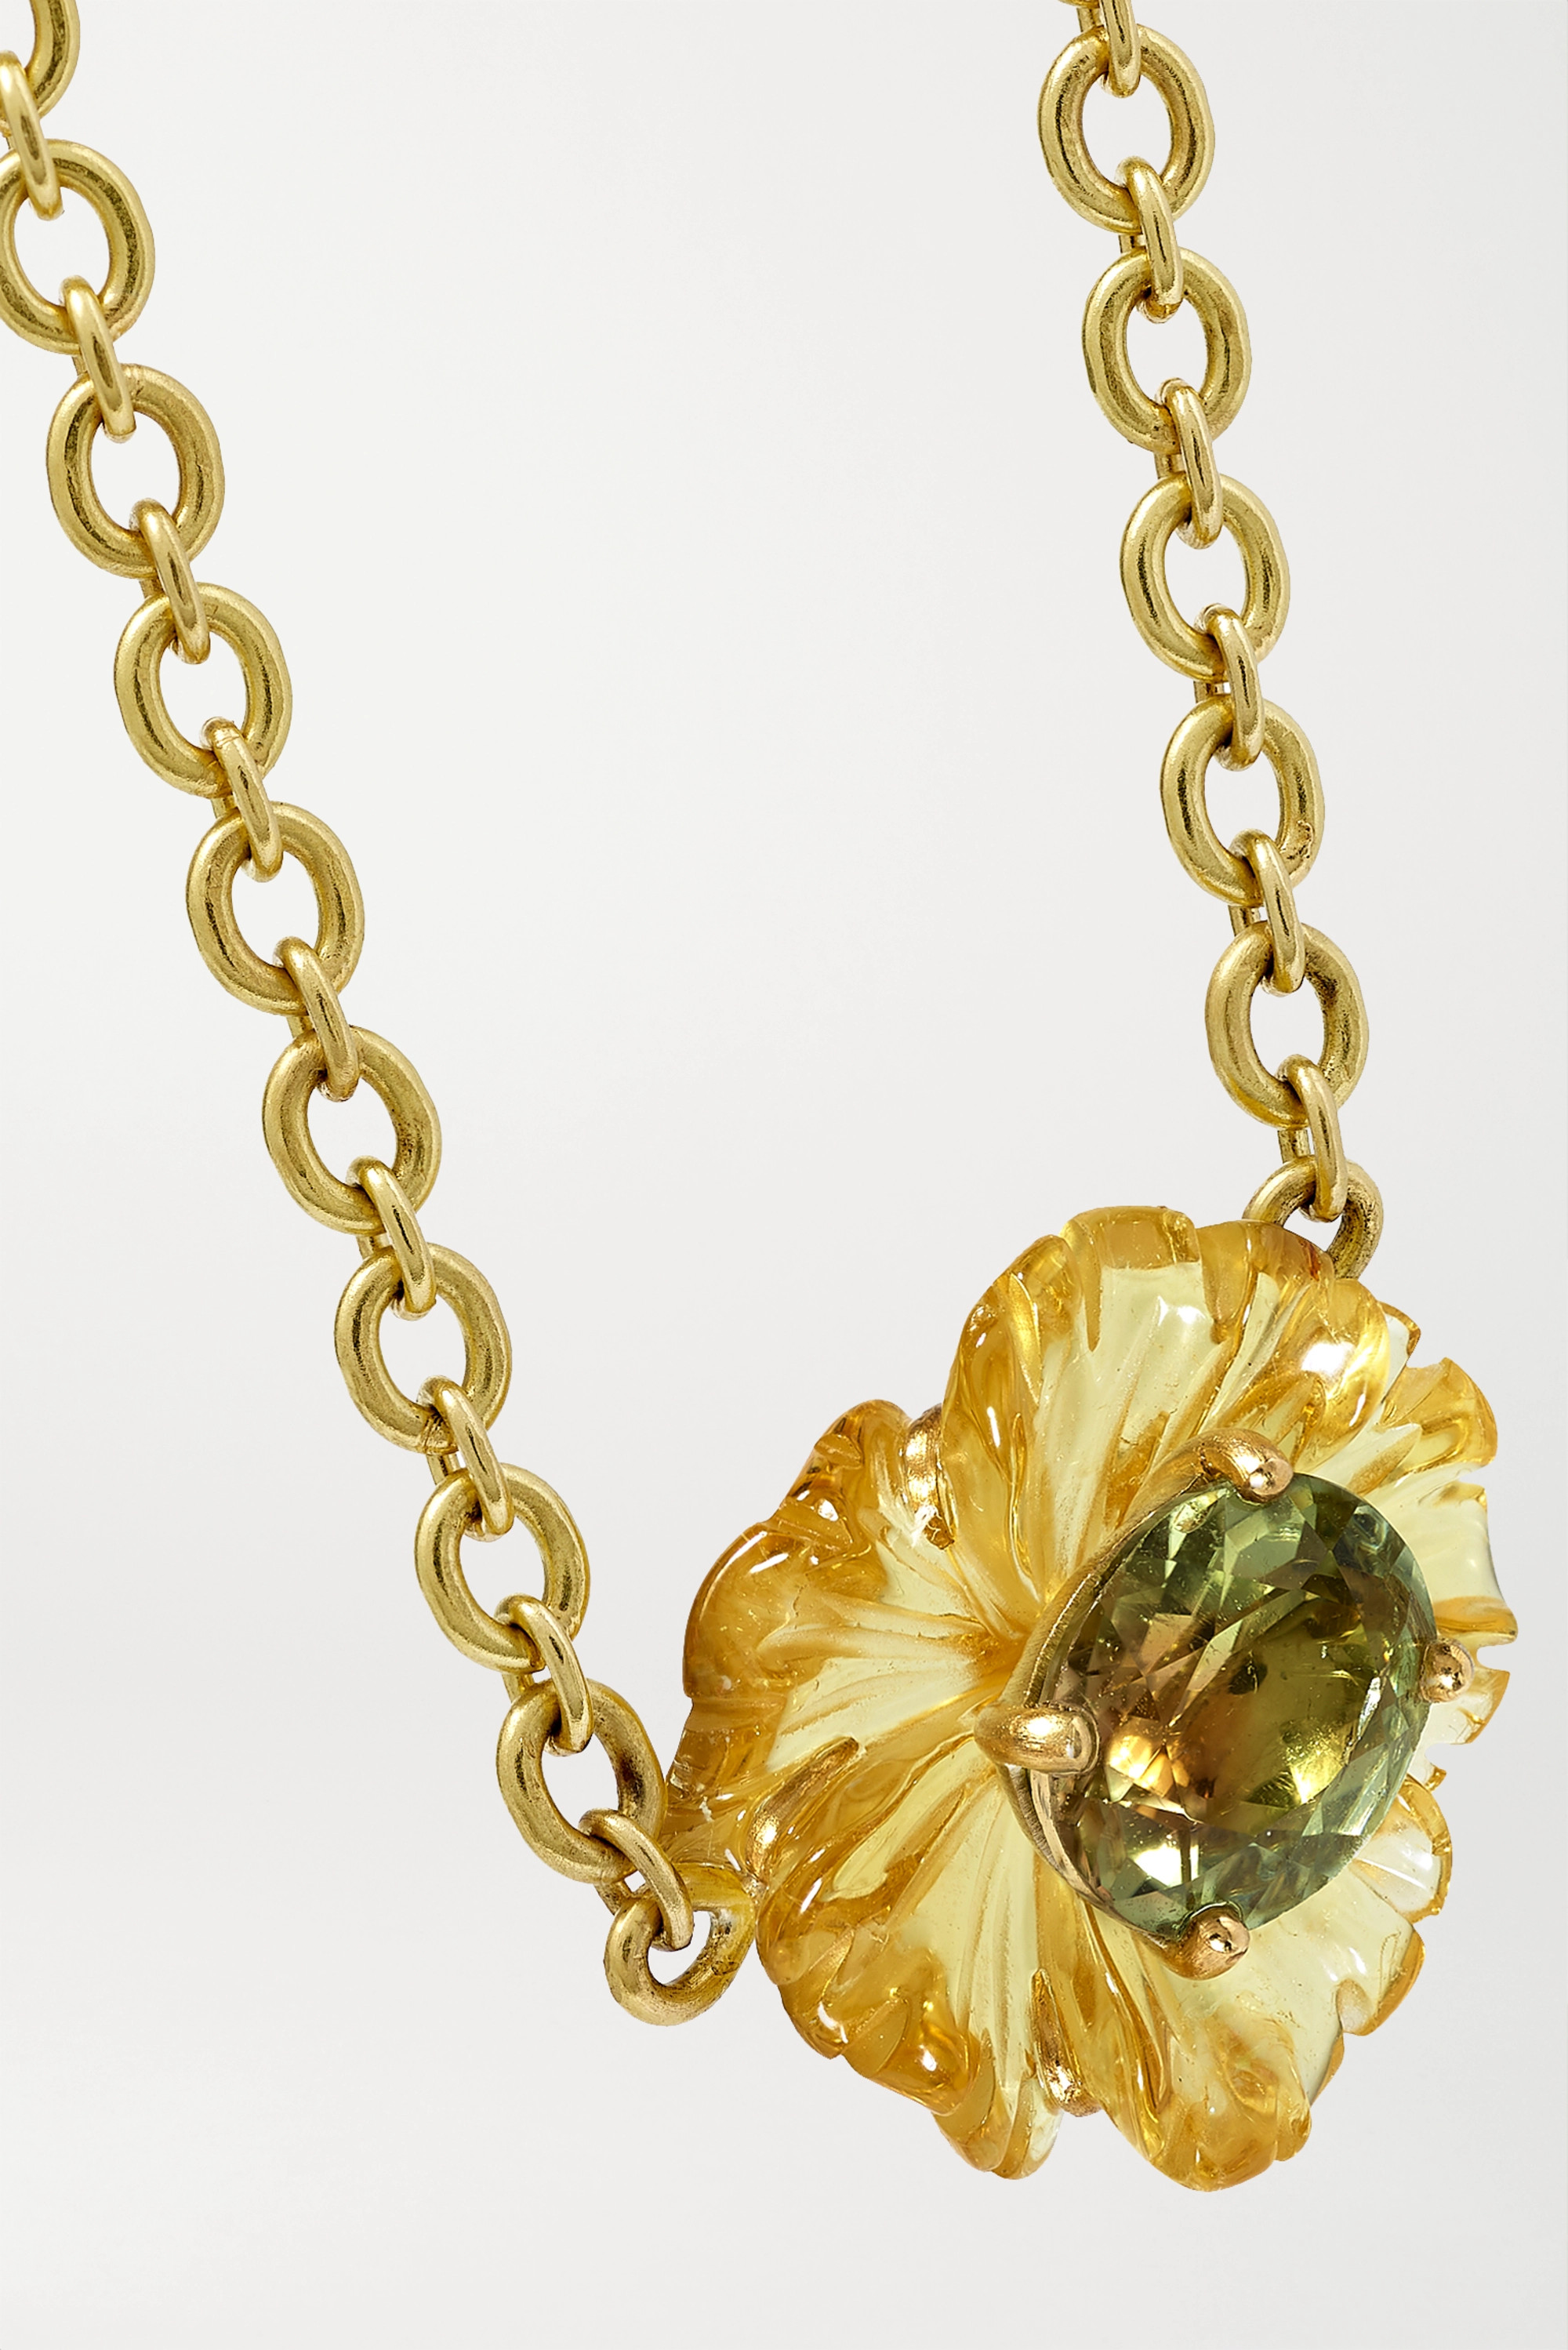 Irene Neuwirth Collier en or 18 carats et tourmalines Tropical Flower